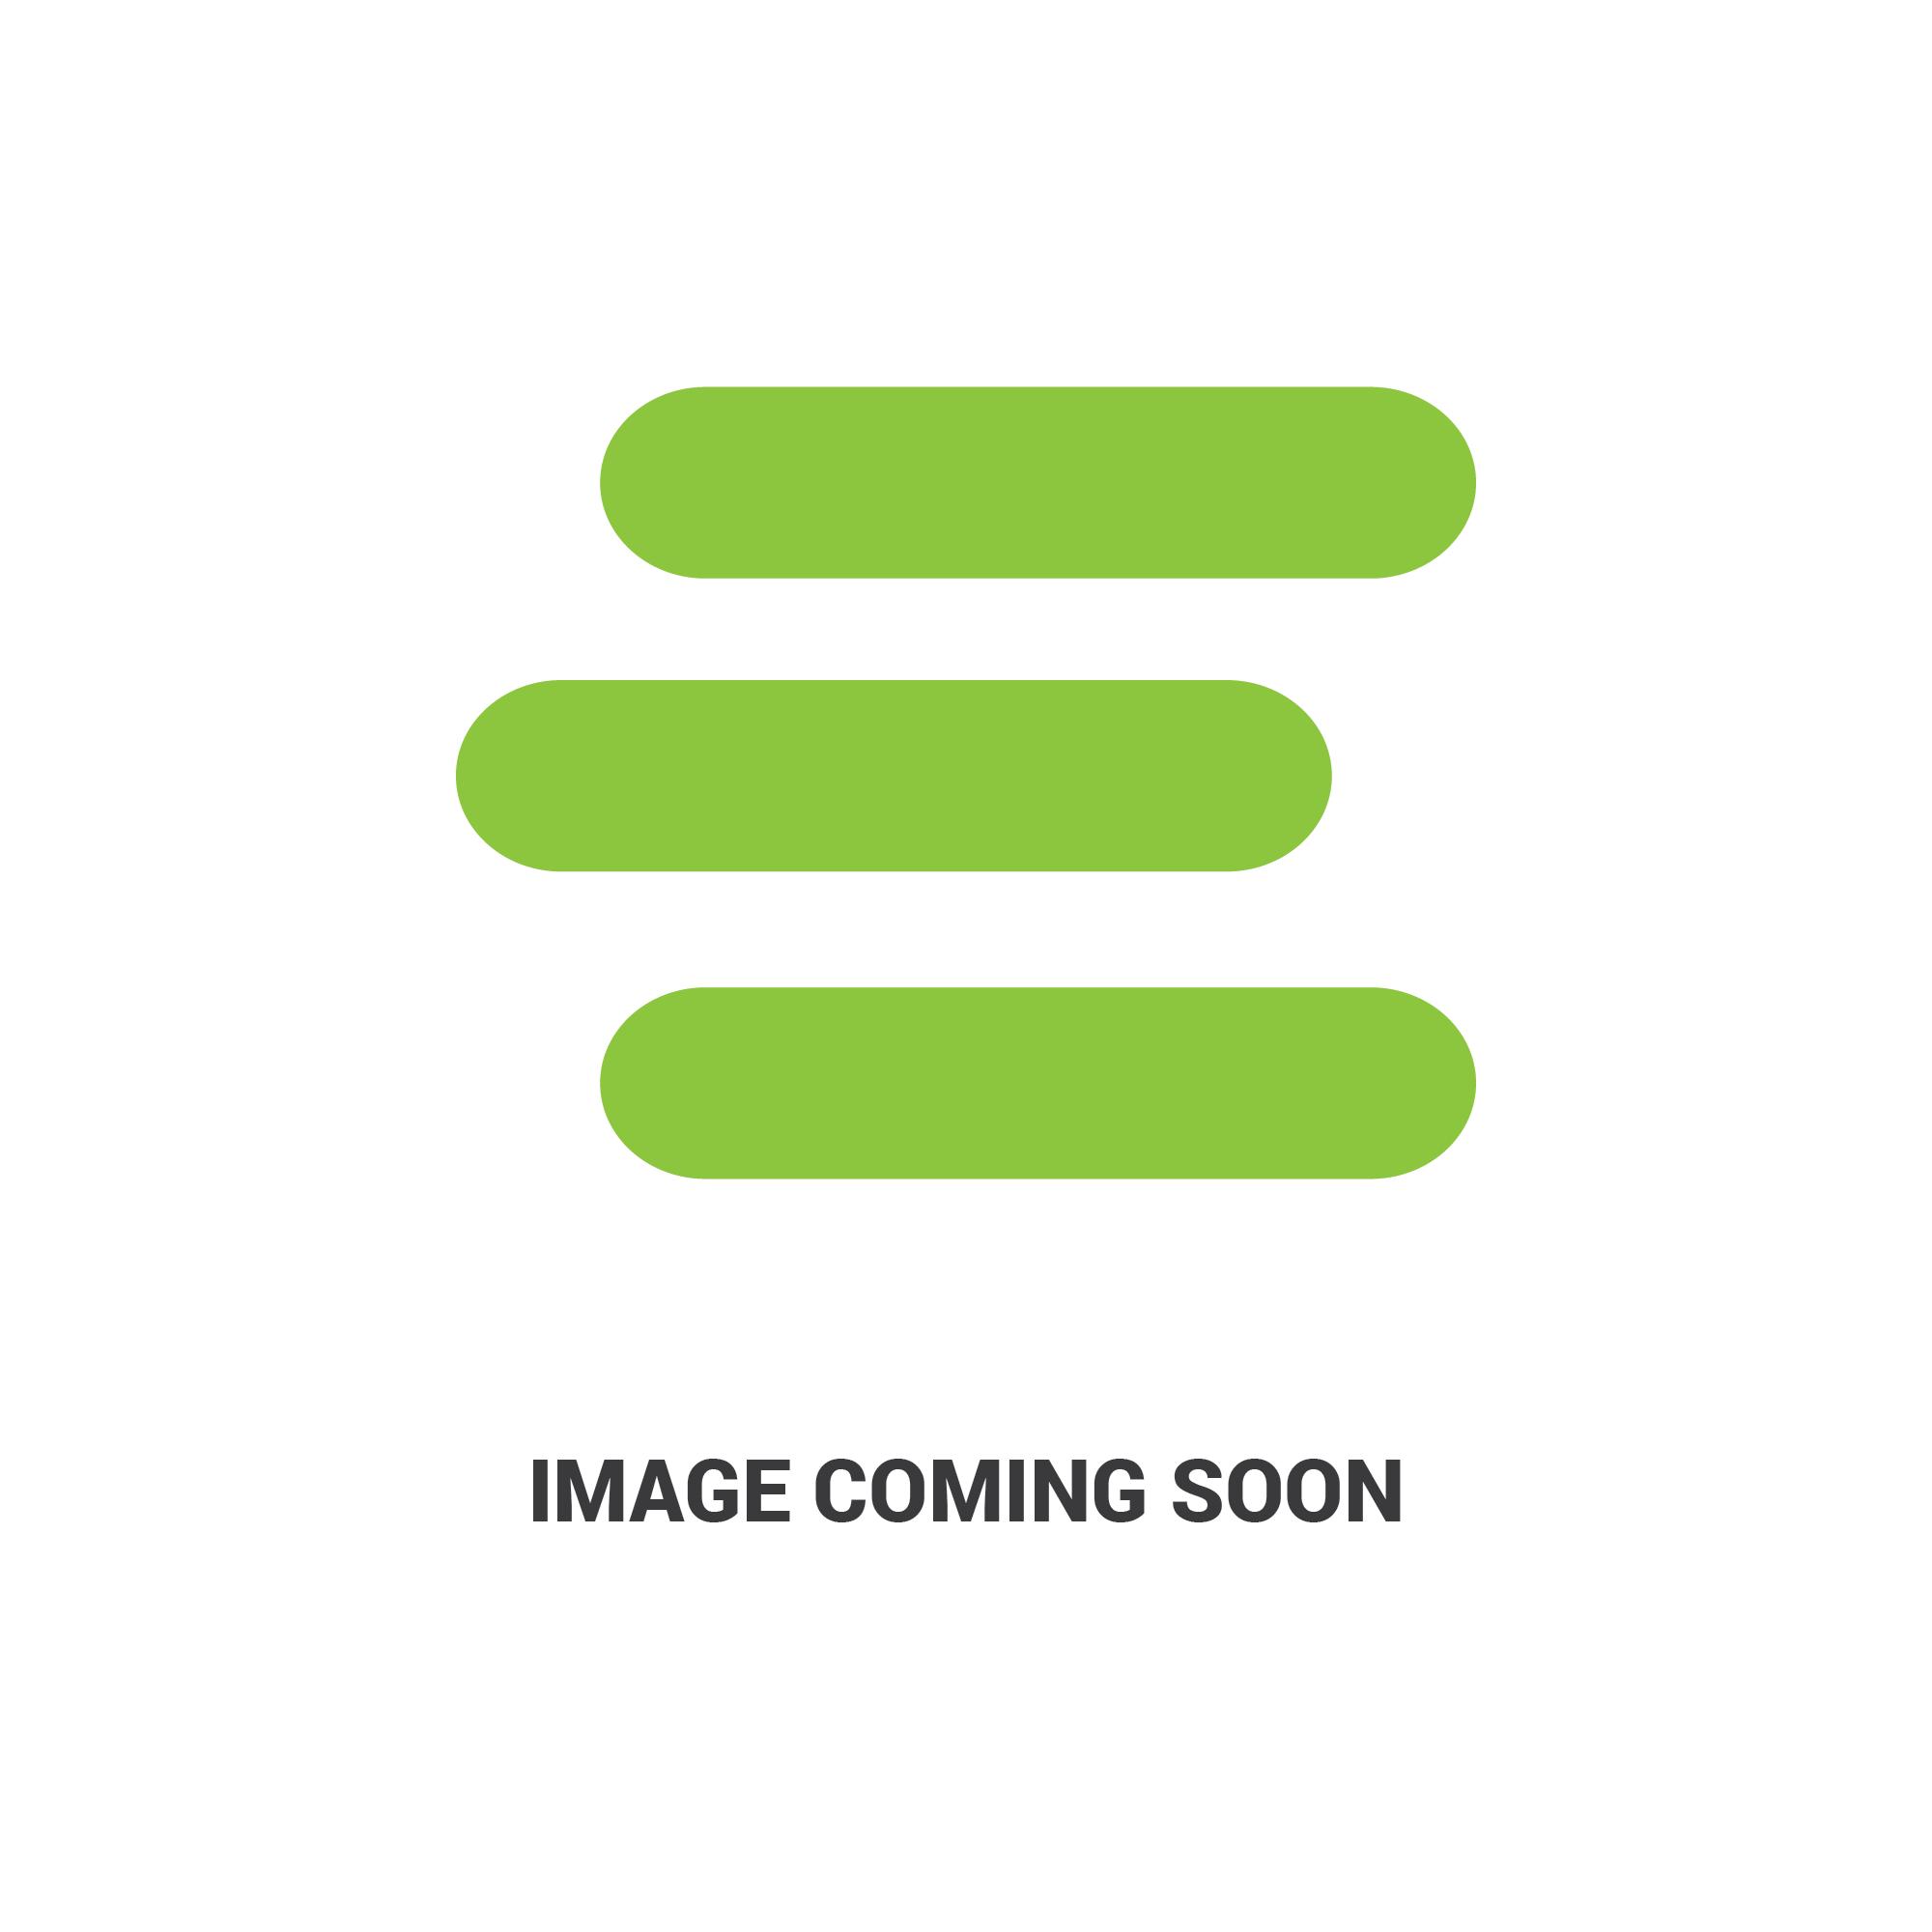 E-71434981220_1.jpg